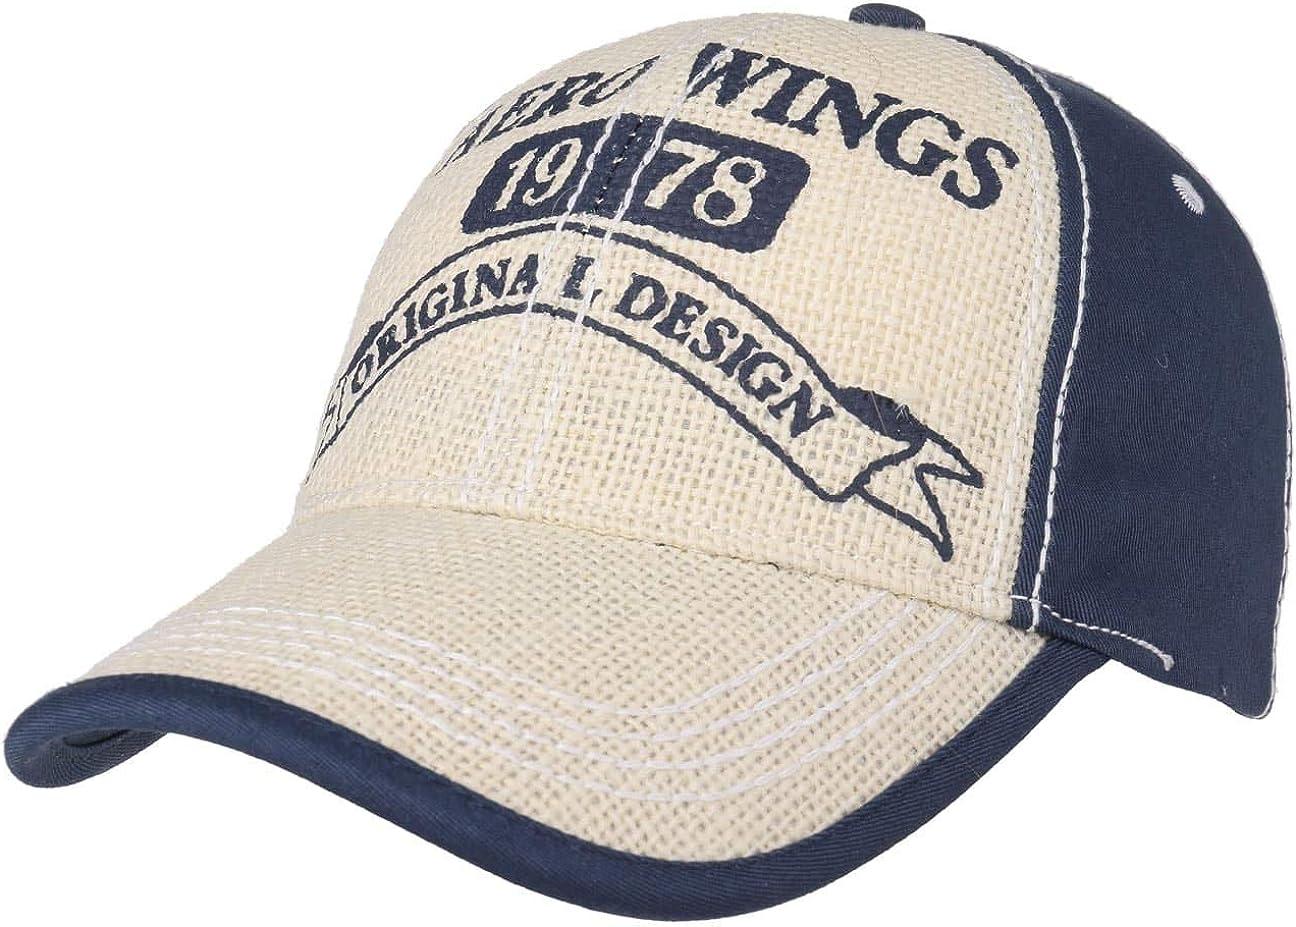 Lipodo Aero Wings Baseball Cap Men Max 48% OFF Beauty products - Women